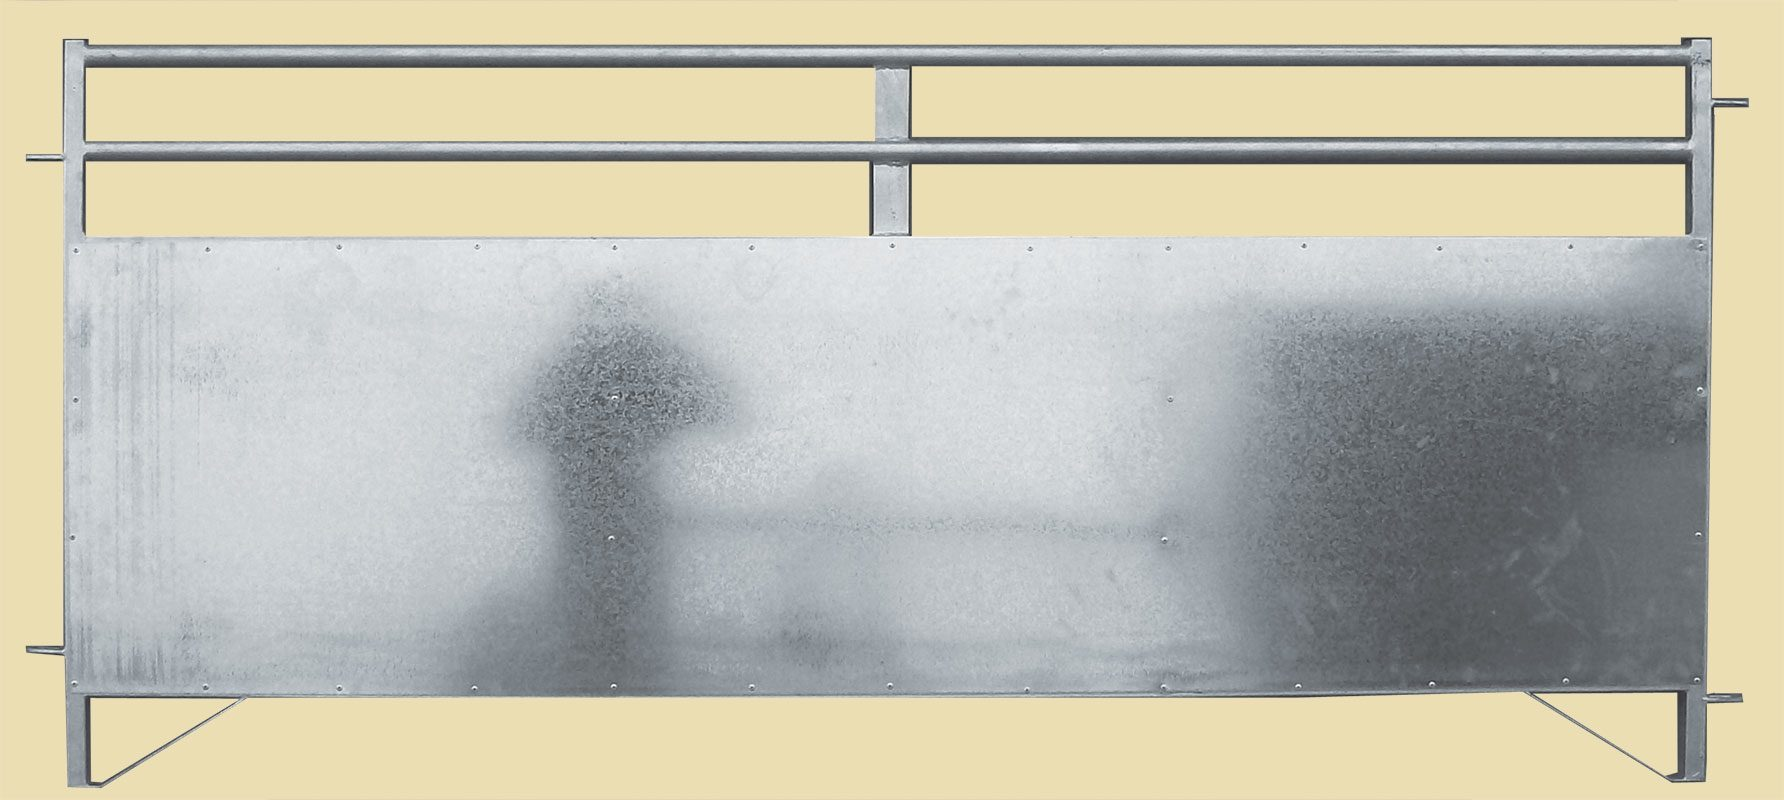 Solid Panels Amp Doors D S Livestock Equipment